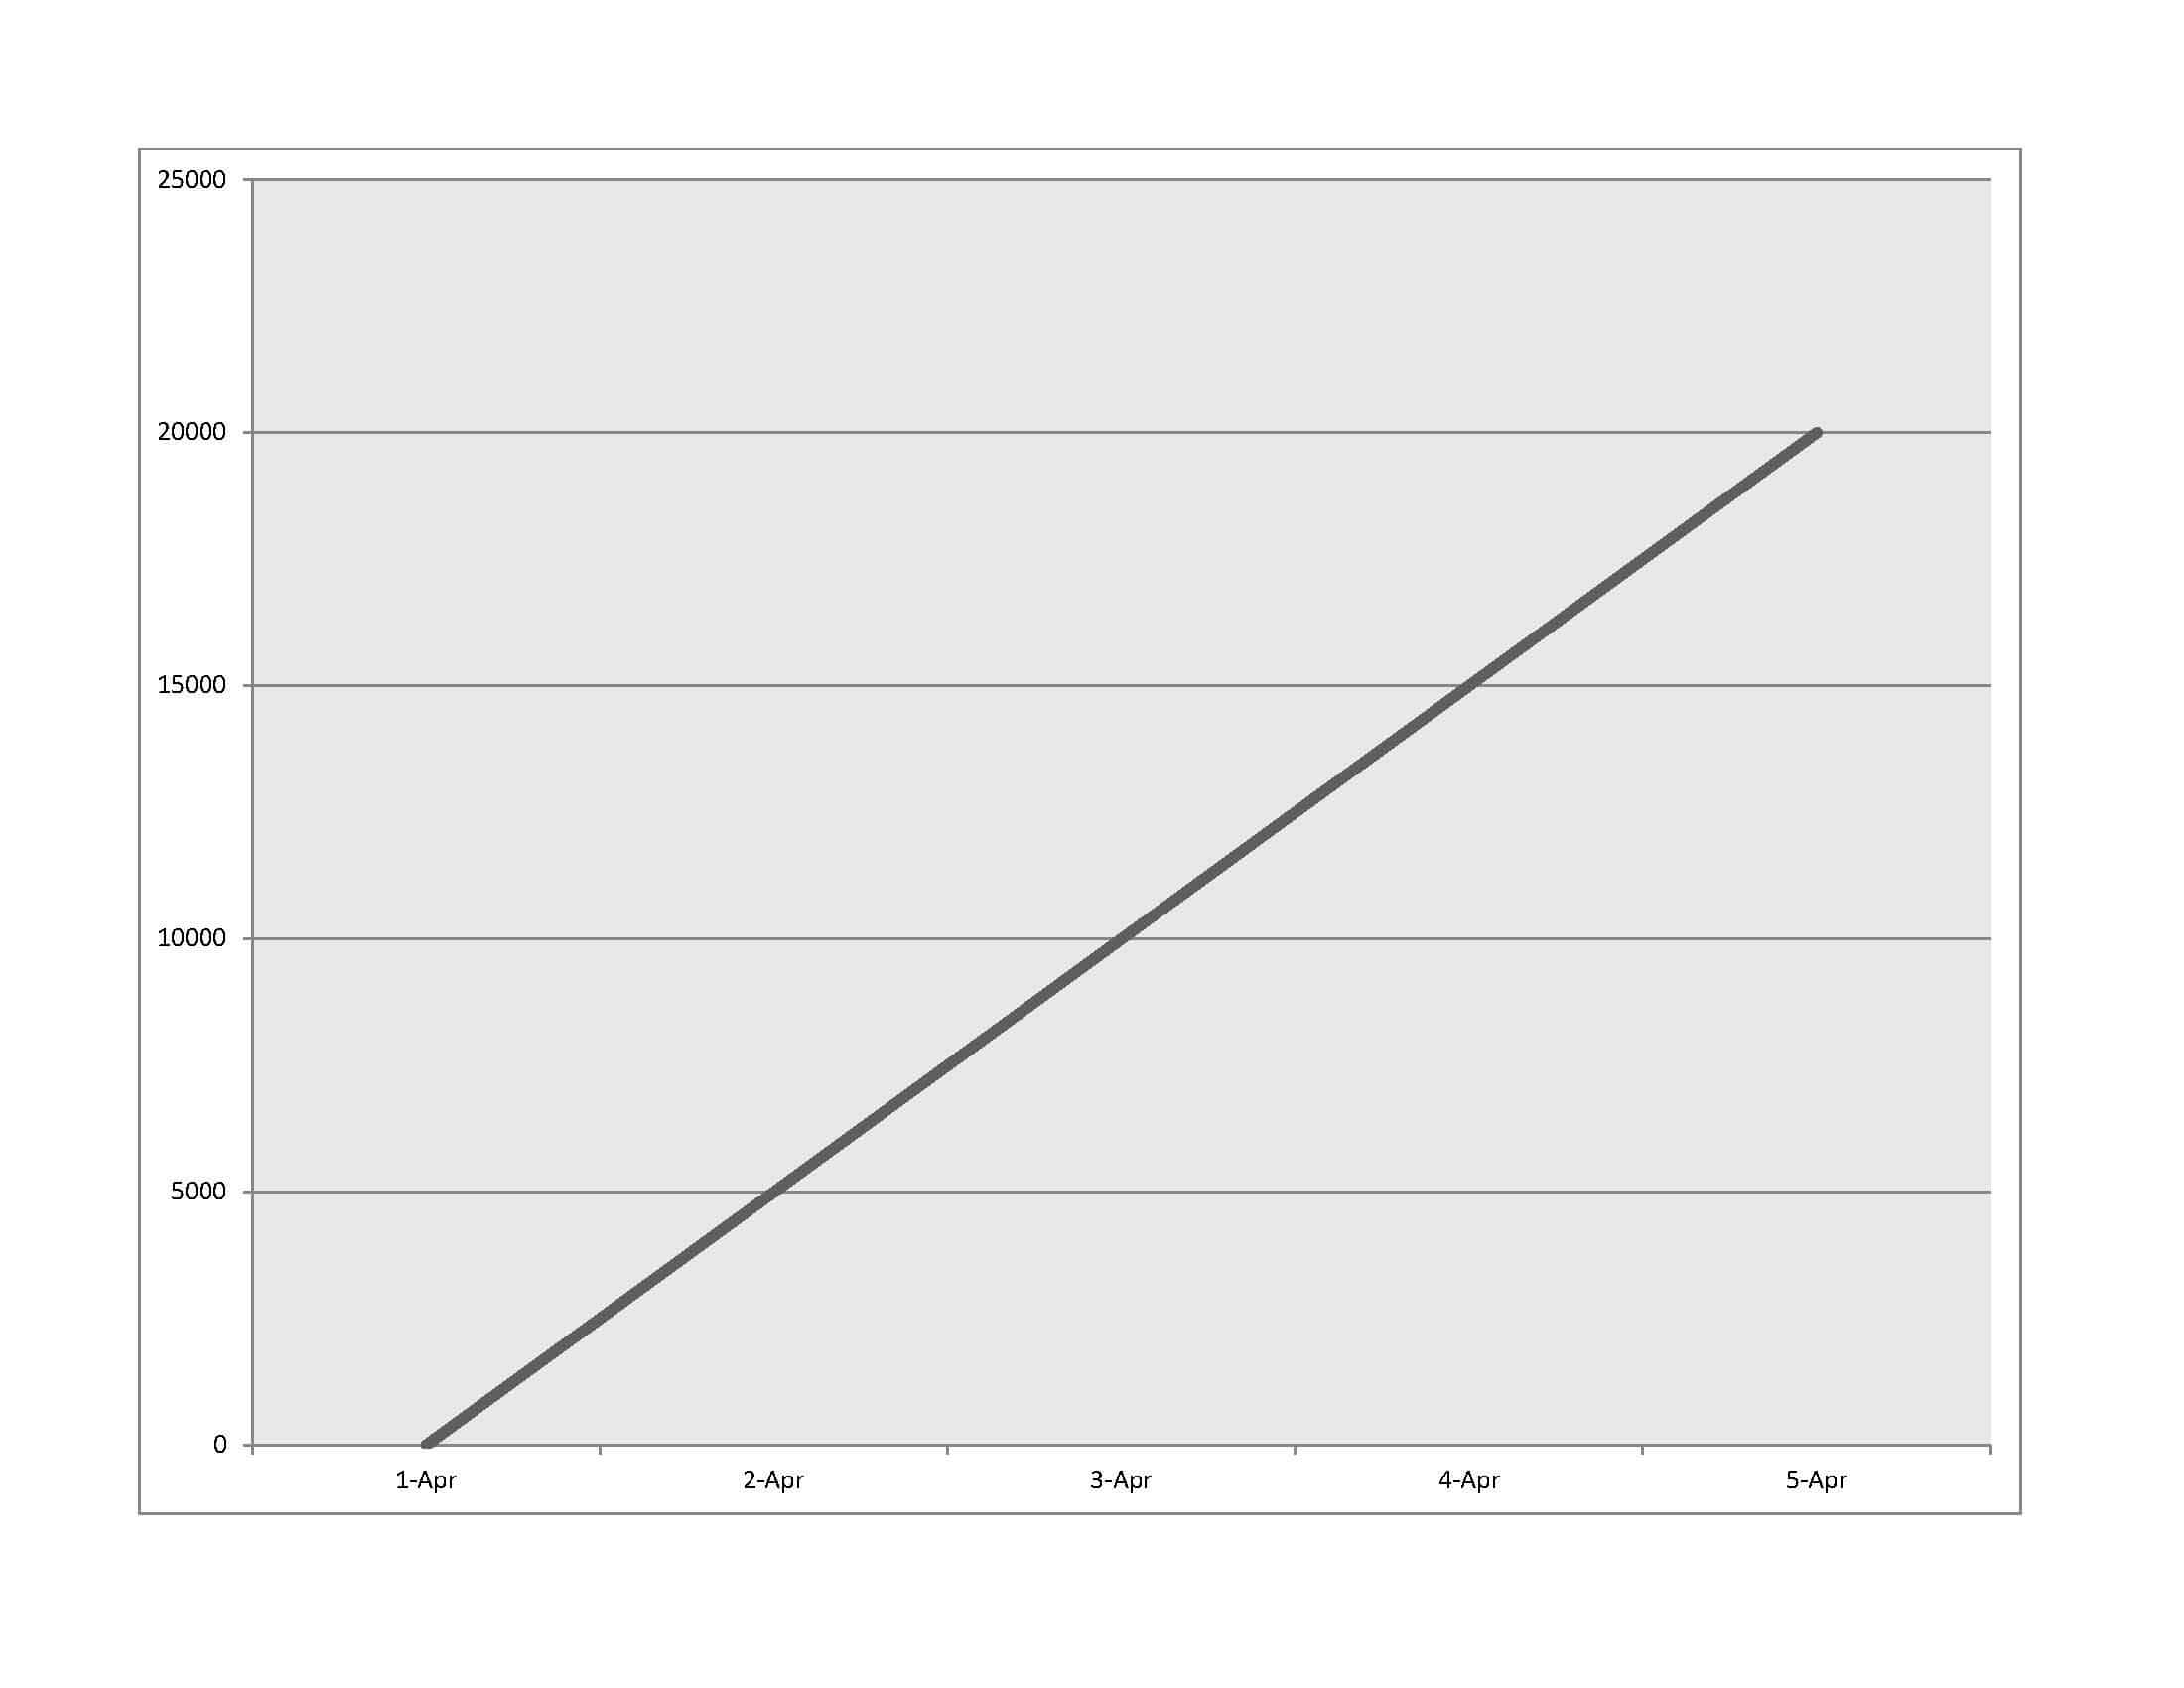 MASTERS H-1B CAP (20,000)